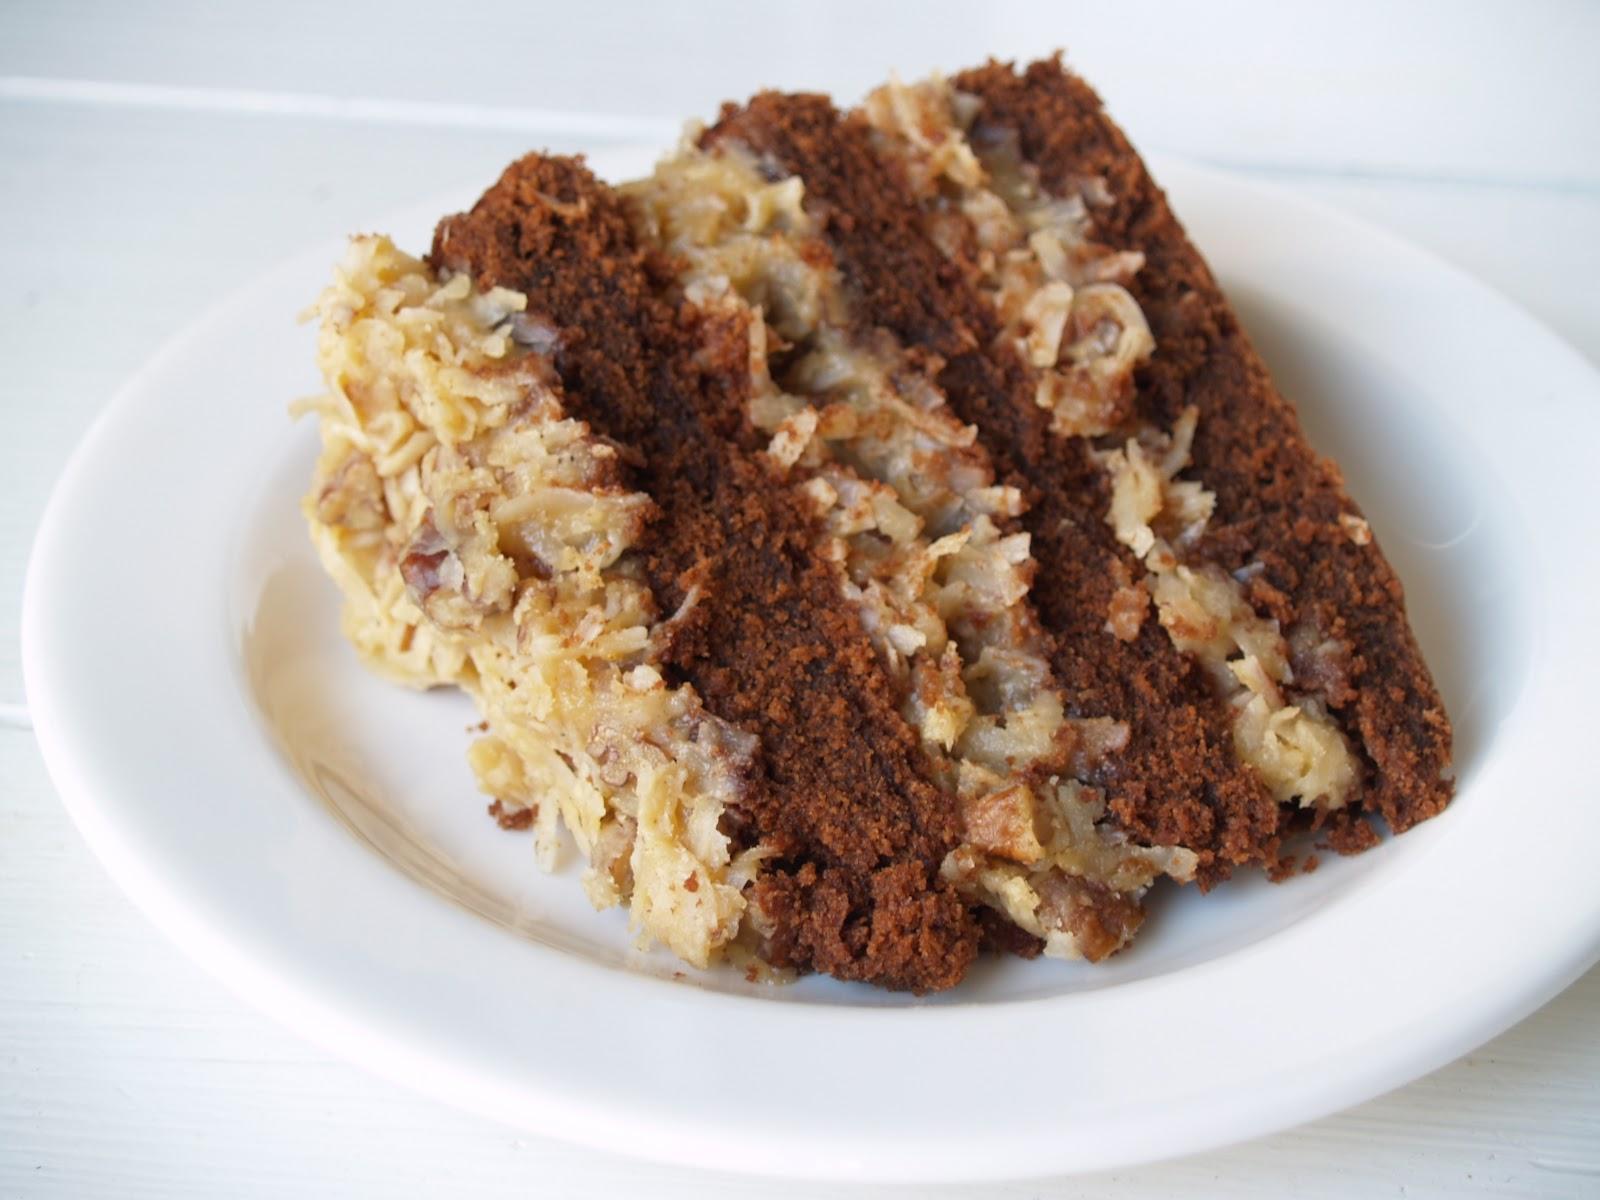 Persimmon and Peach German Chocolate Cake